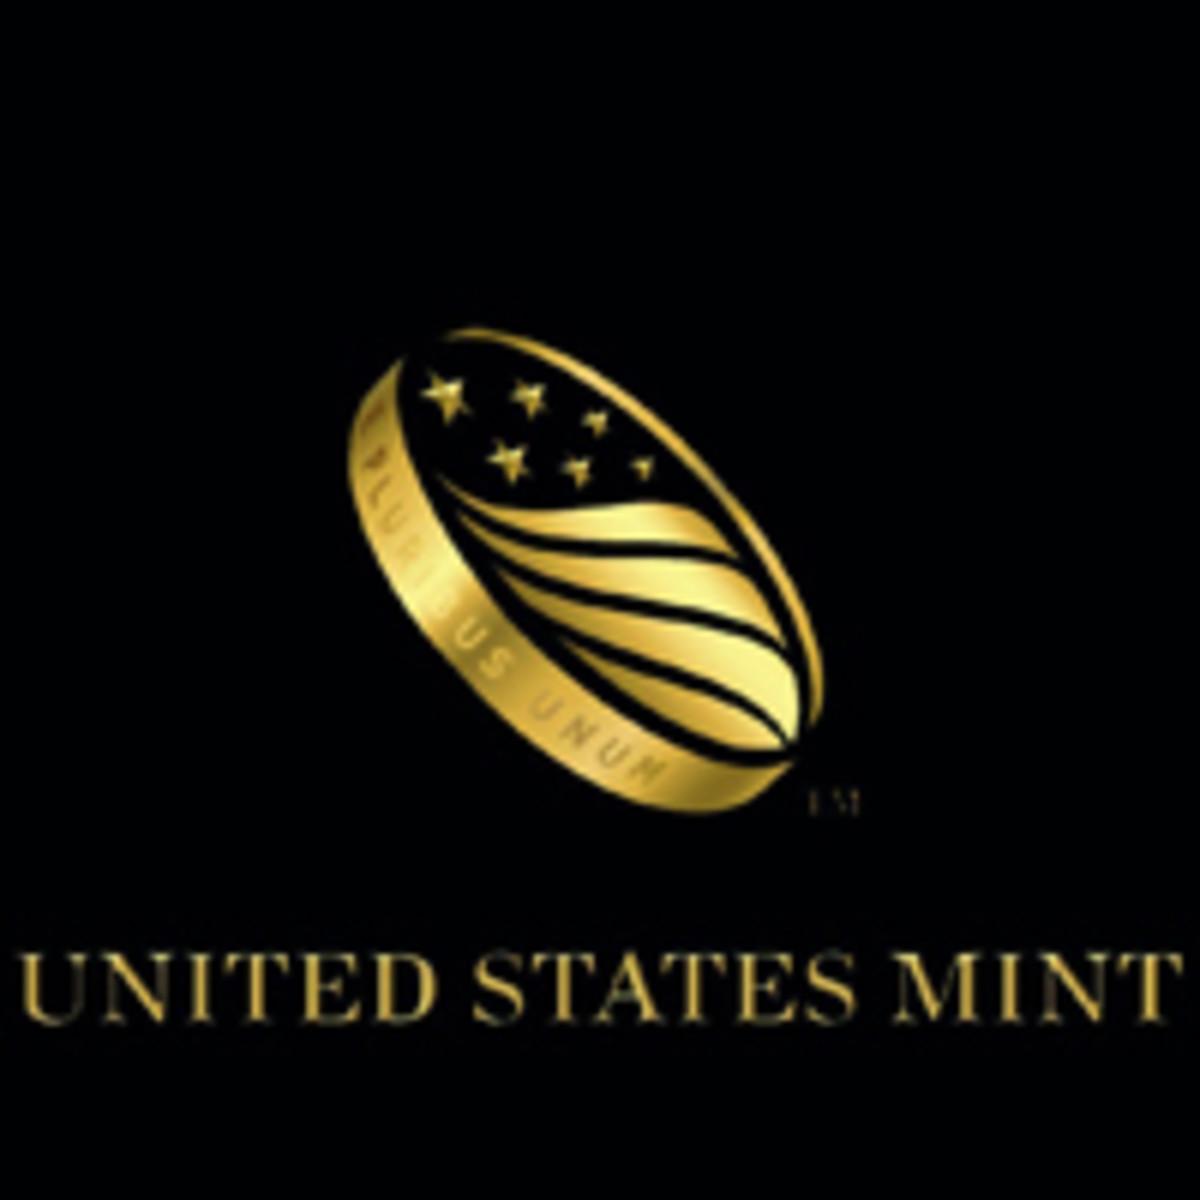 (Image courtesy www.usmint.gov)